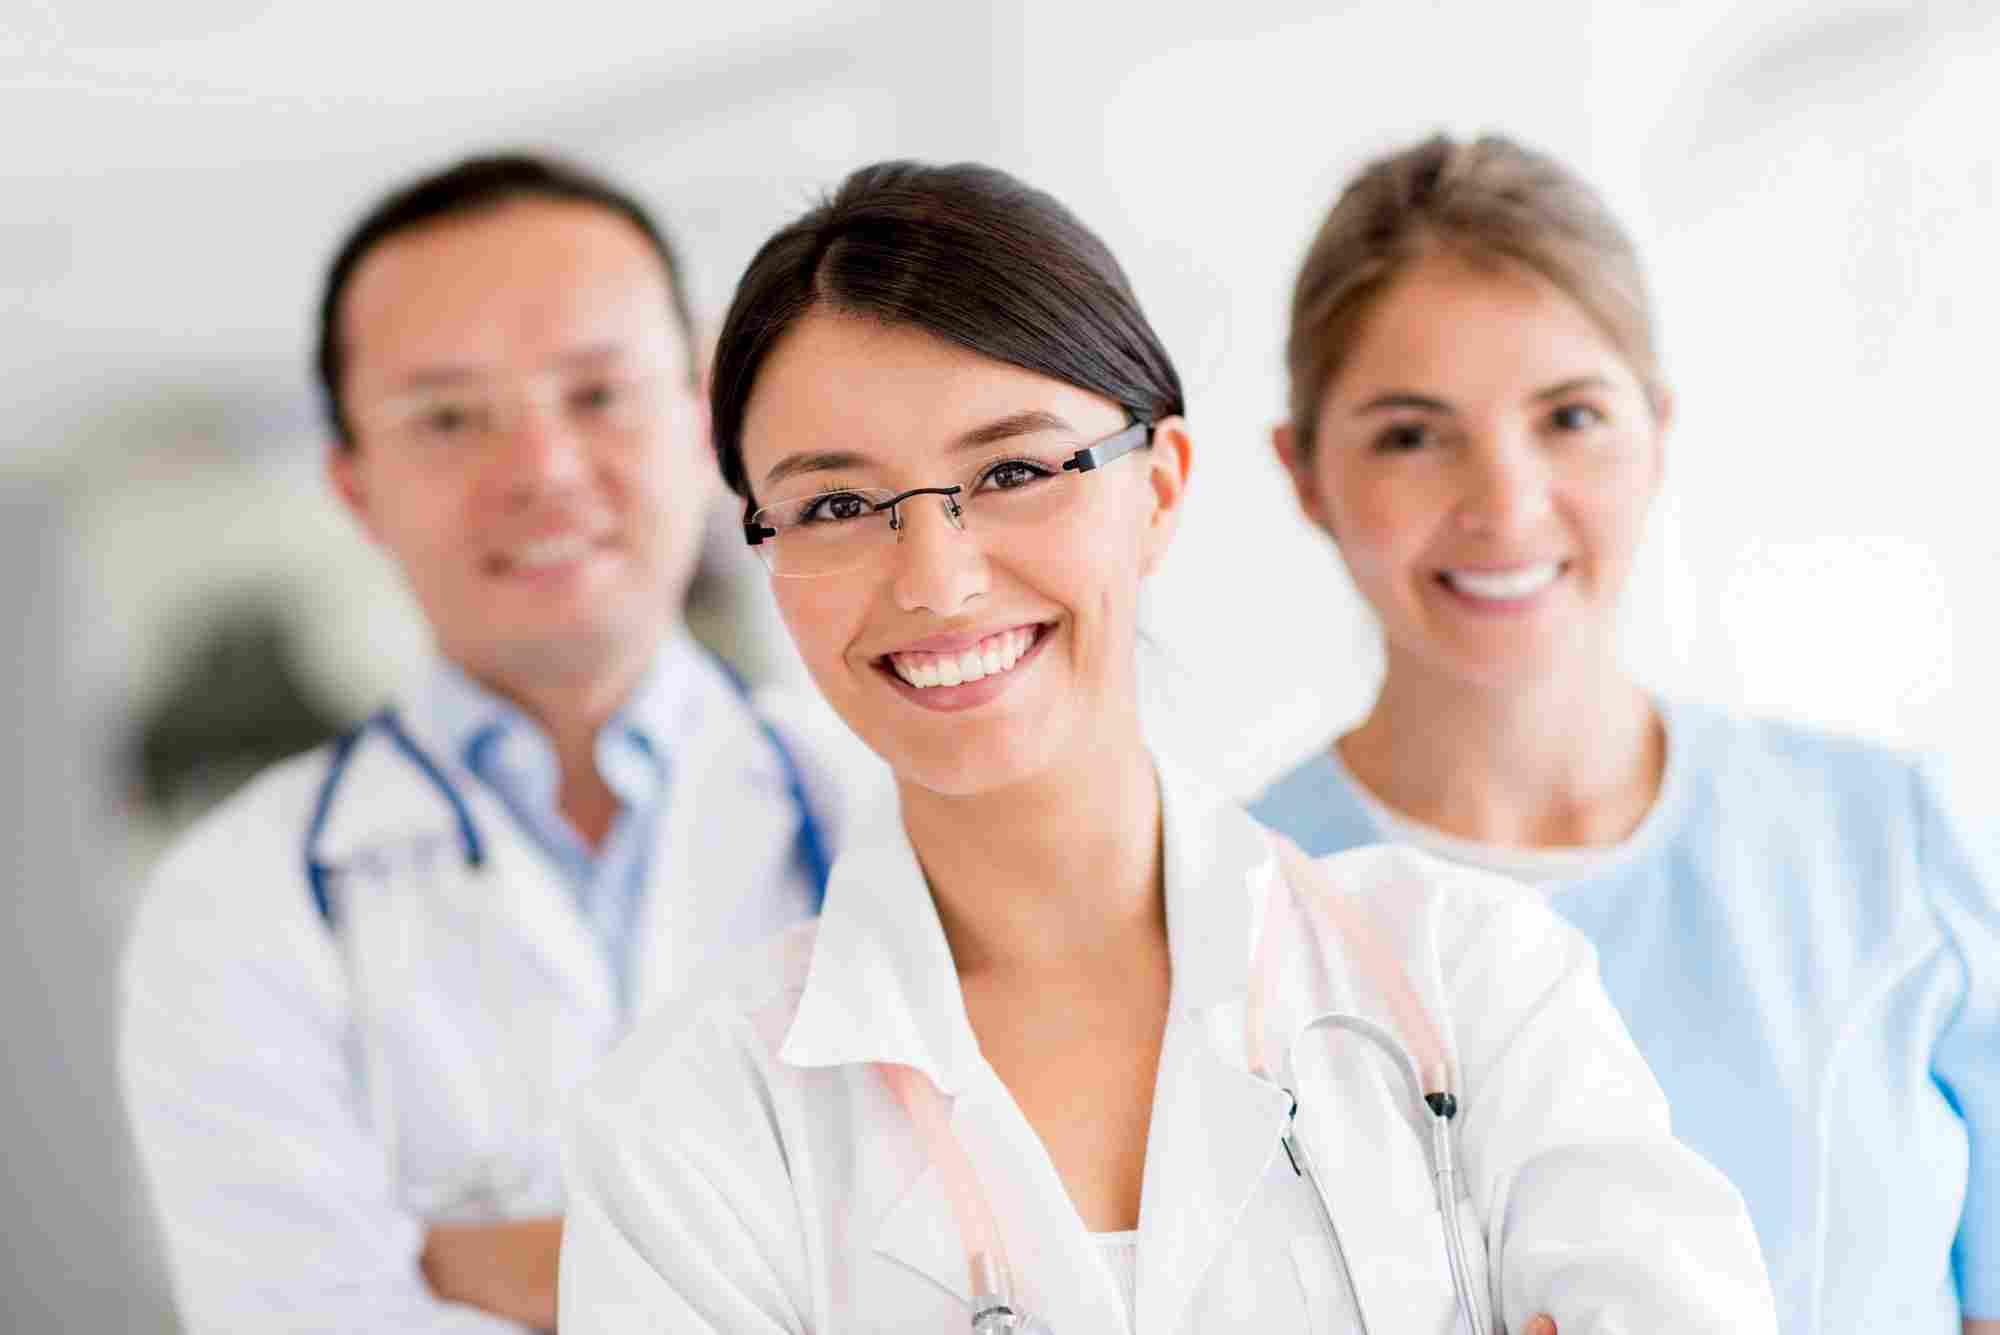 http://www.nzoz-promed.pl/wp-content/uploads/2015/12/doctors.jpg